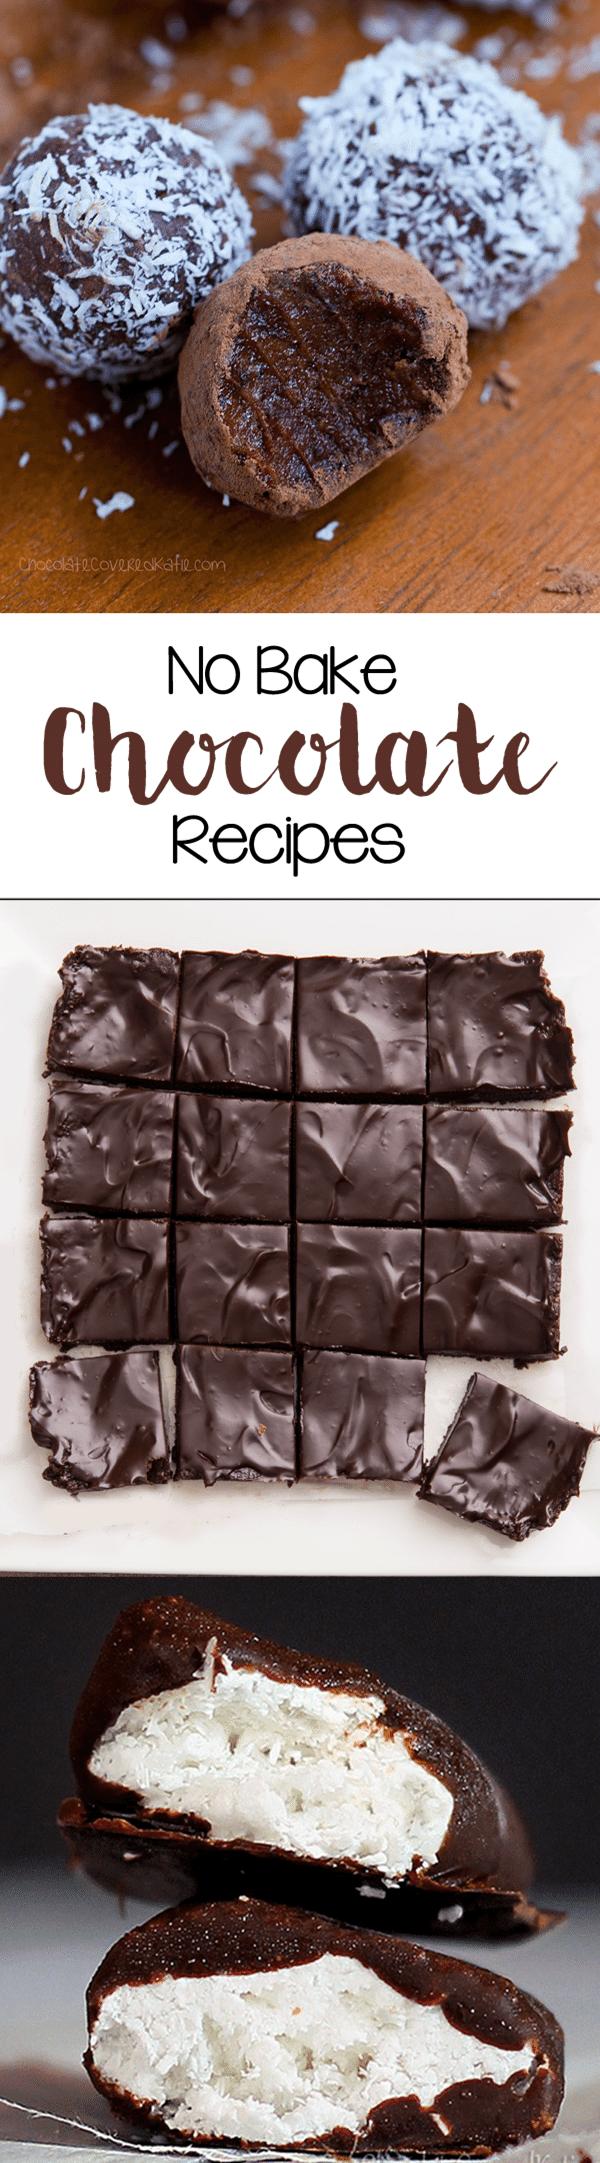 "NO BAKE RECIPES - 50 easy chocolate ""no bake"" treats, including no bake cookies ▪ no bake bars ▪ no bake desserts...from @choccoveredkt - http://chocolatecoveredkatie.com/2016/02/11/no-bake-chocolate-recipes-healthy-easy/"